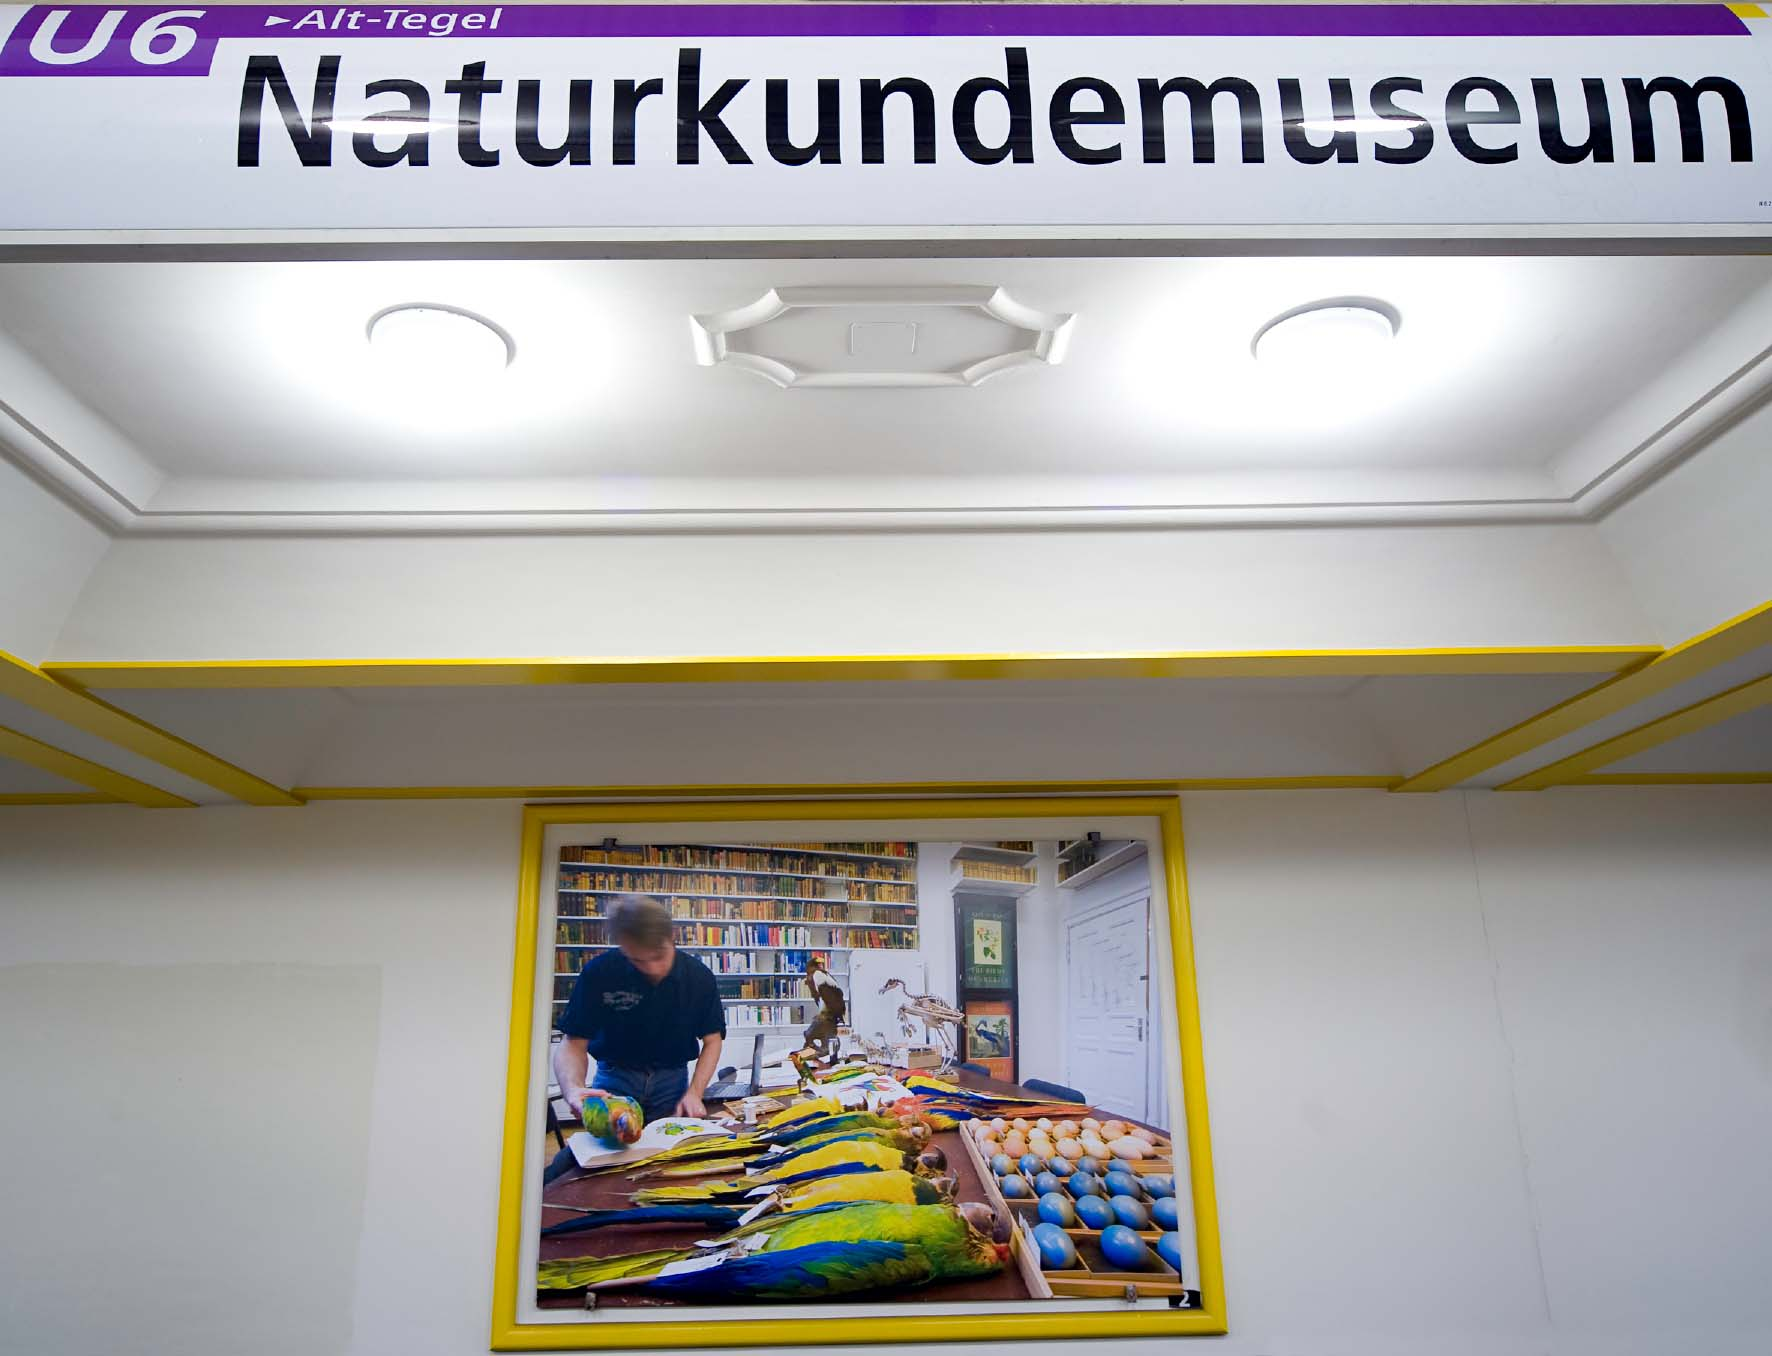 U-Bahnhof Naturkundemuseum